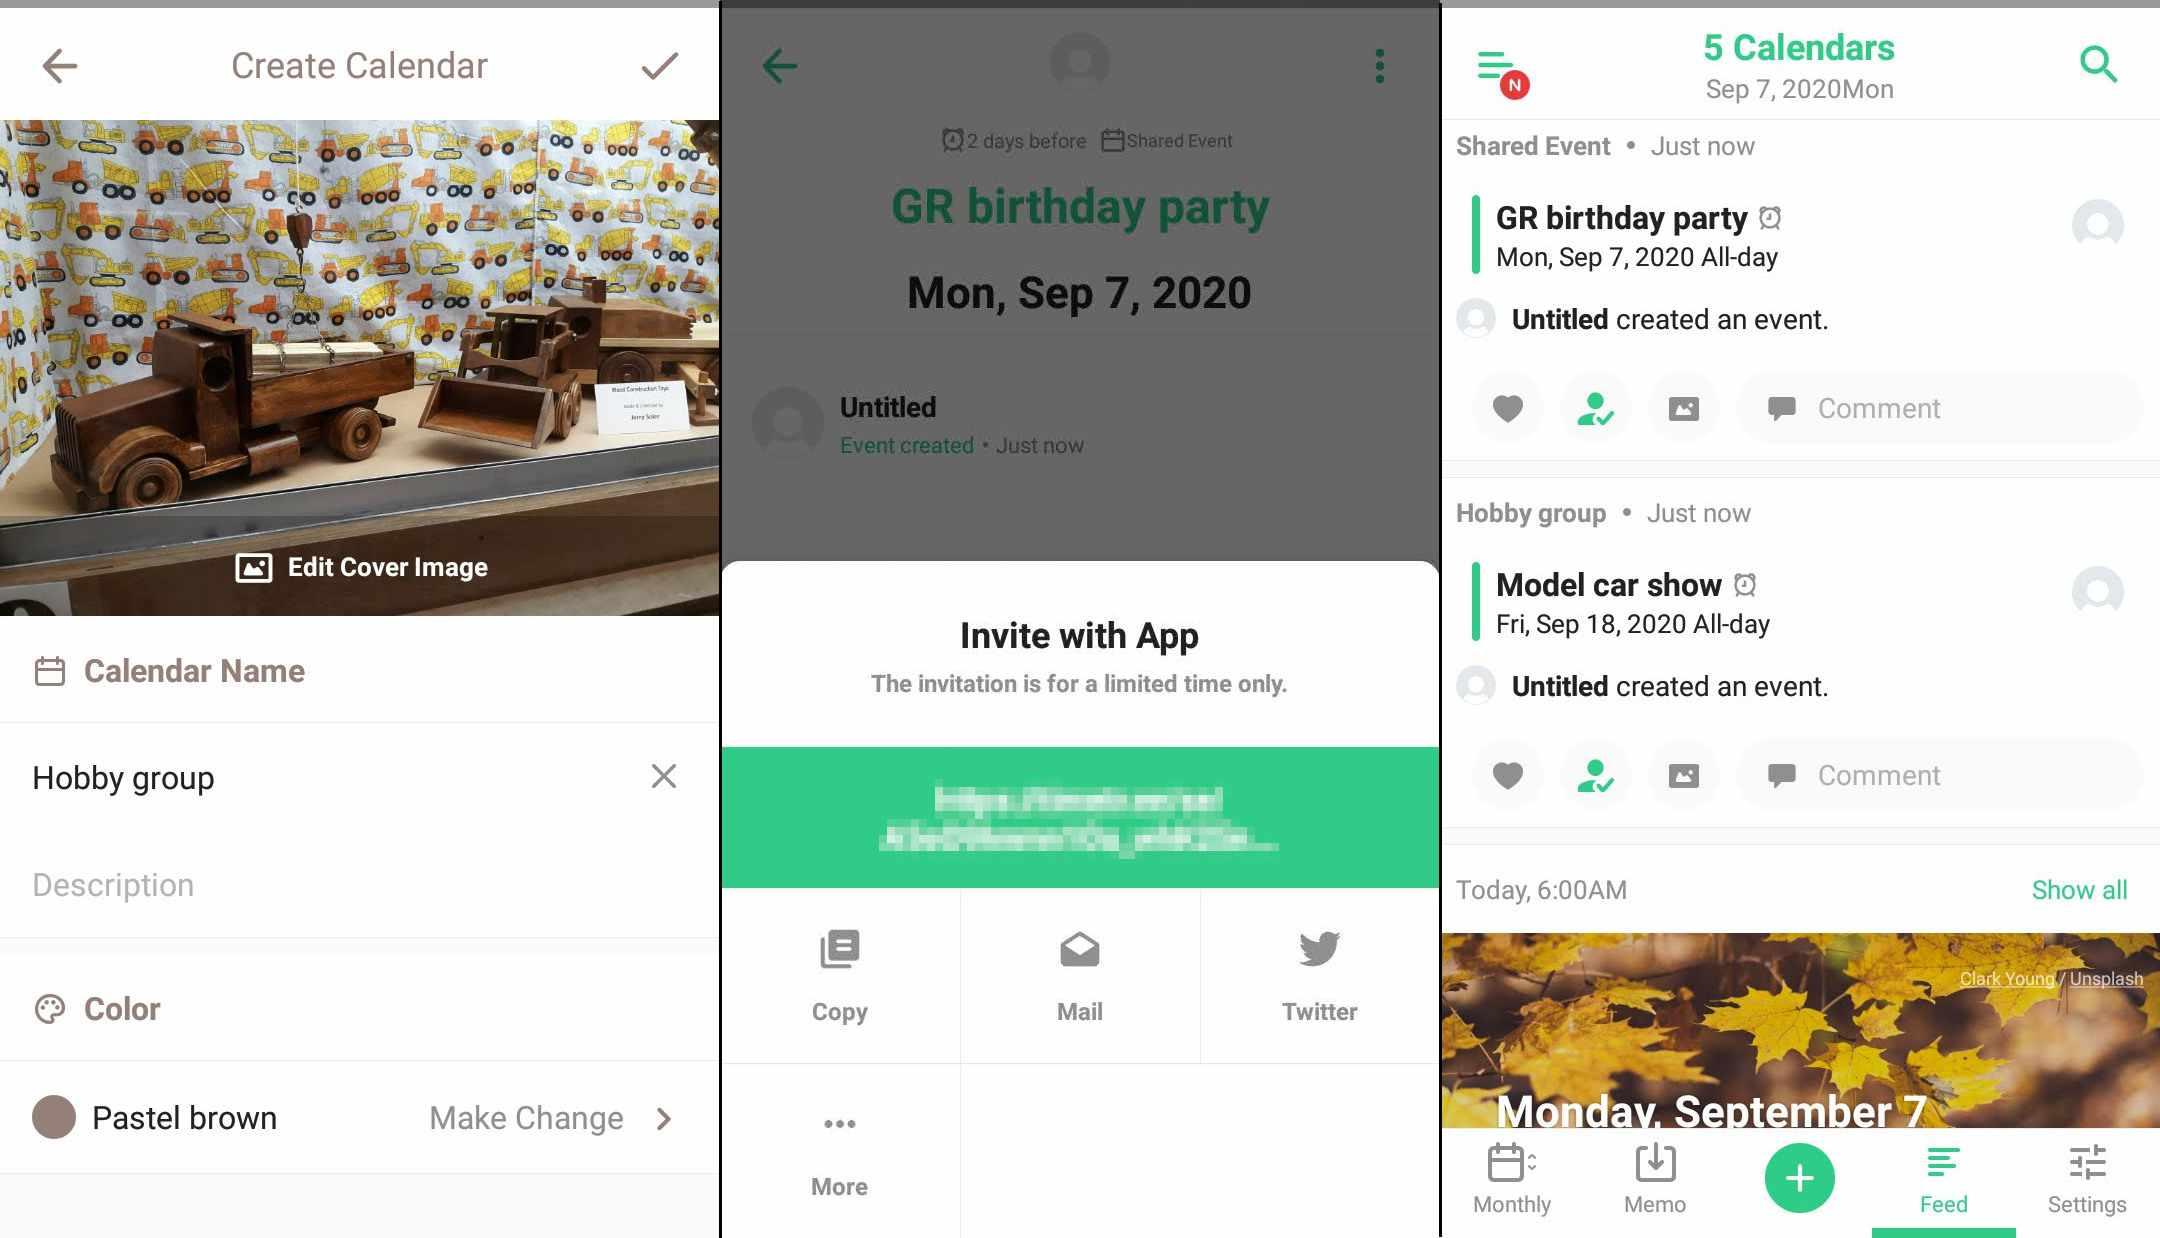 Create a calendar, invite to a calendar, and view daily agenda with TimeTree